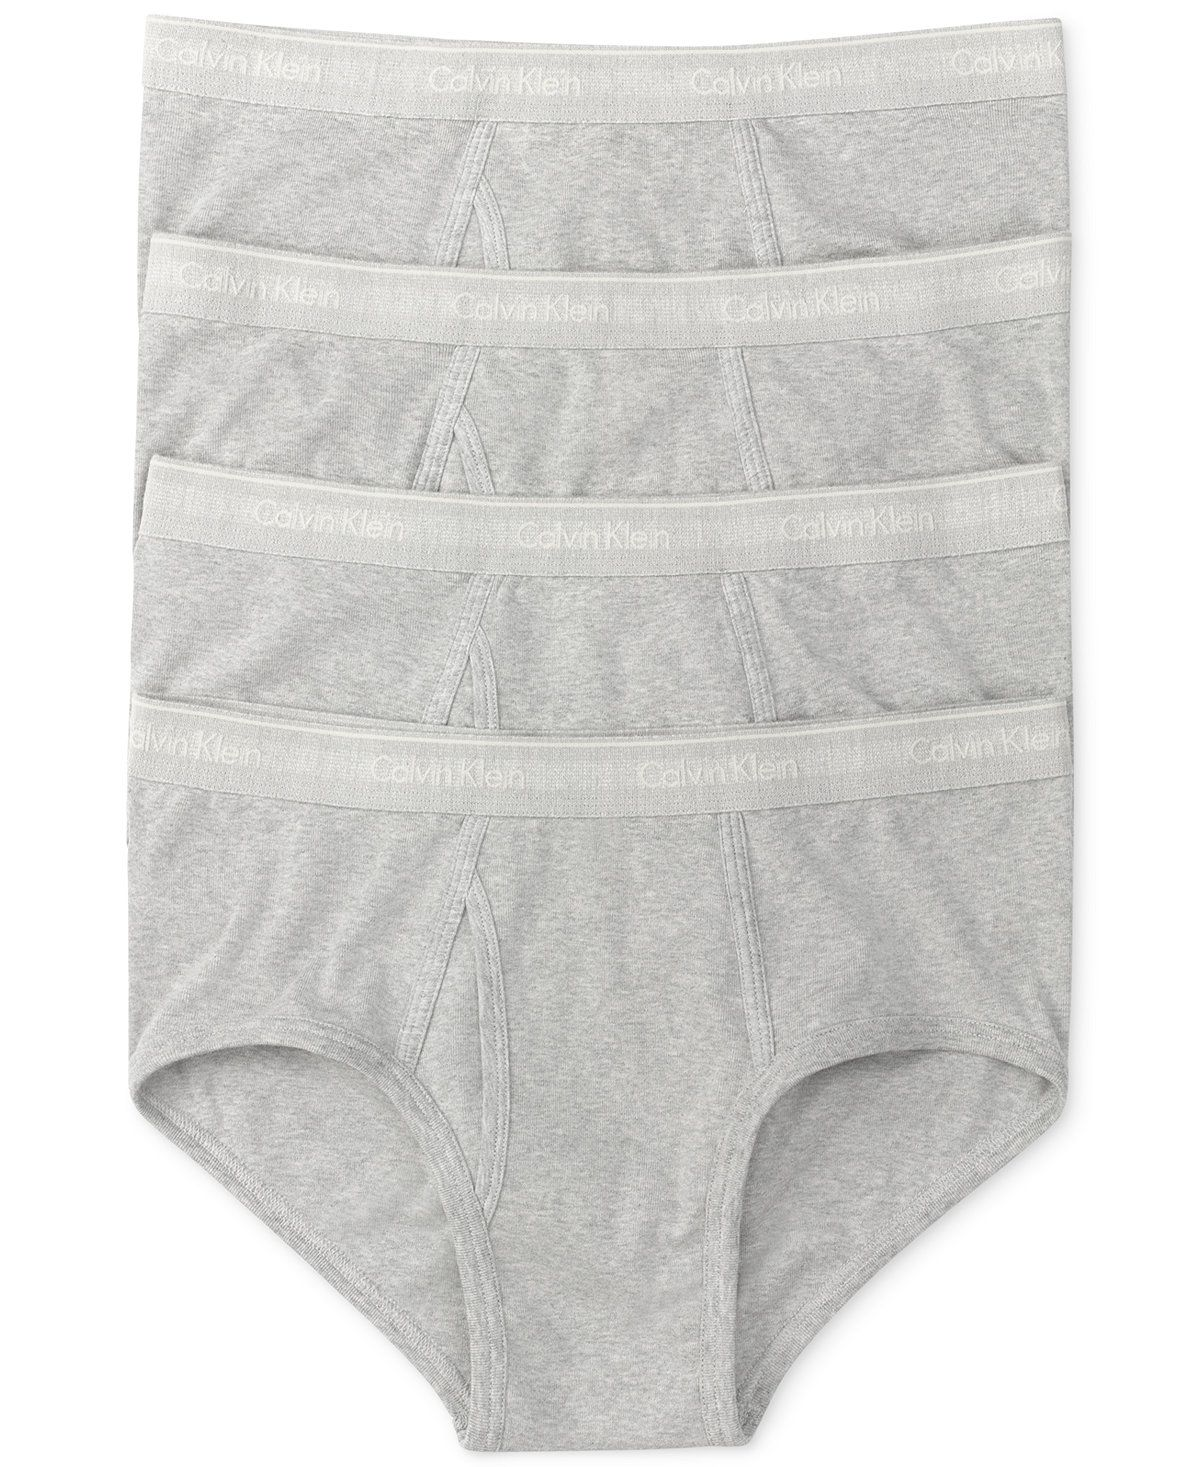 f6f26aec75ec Calvin Klein Men's Classic Briefs 4-Pack U4000 - Underwear & Undershirts -  Men - Macy's